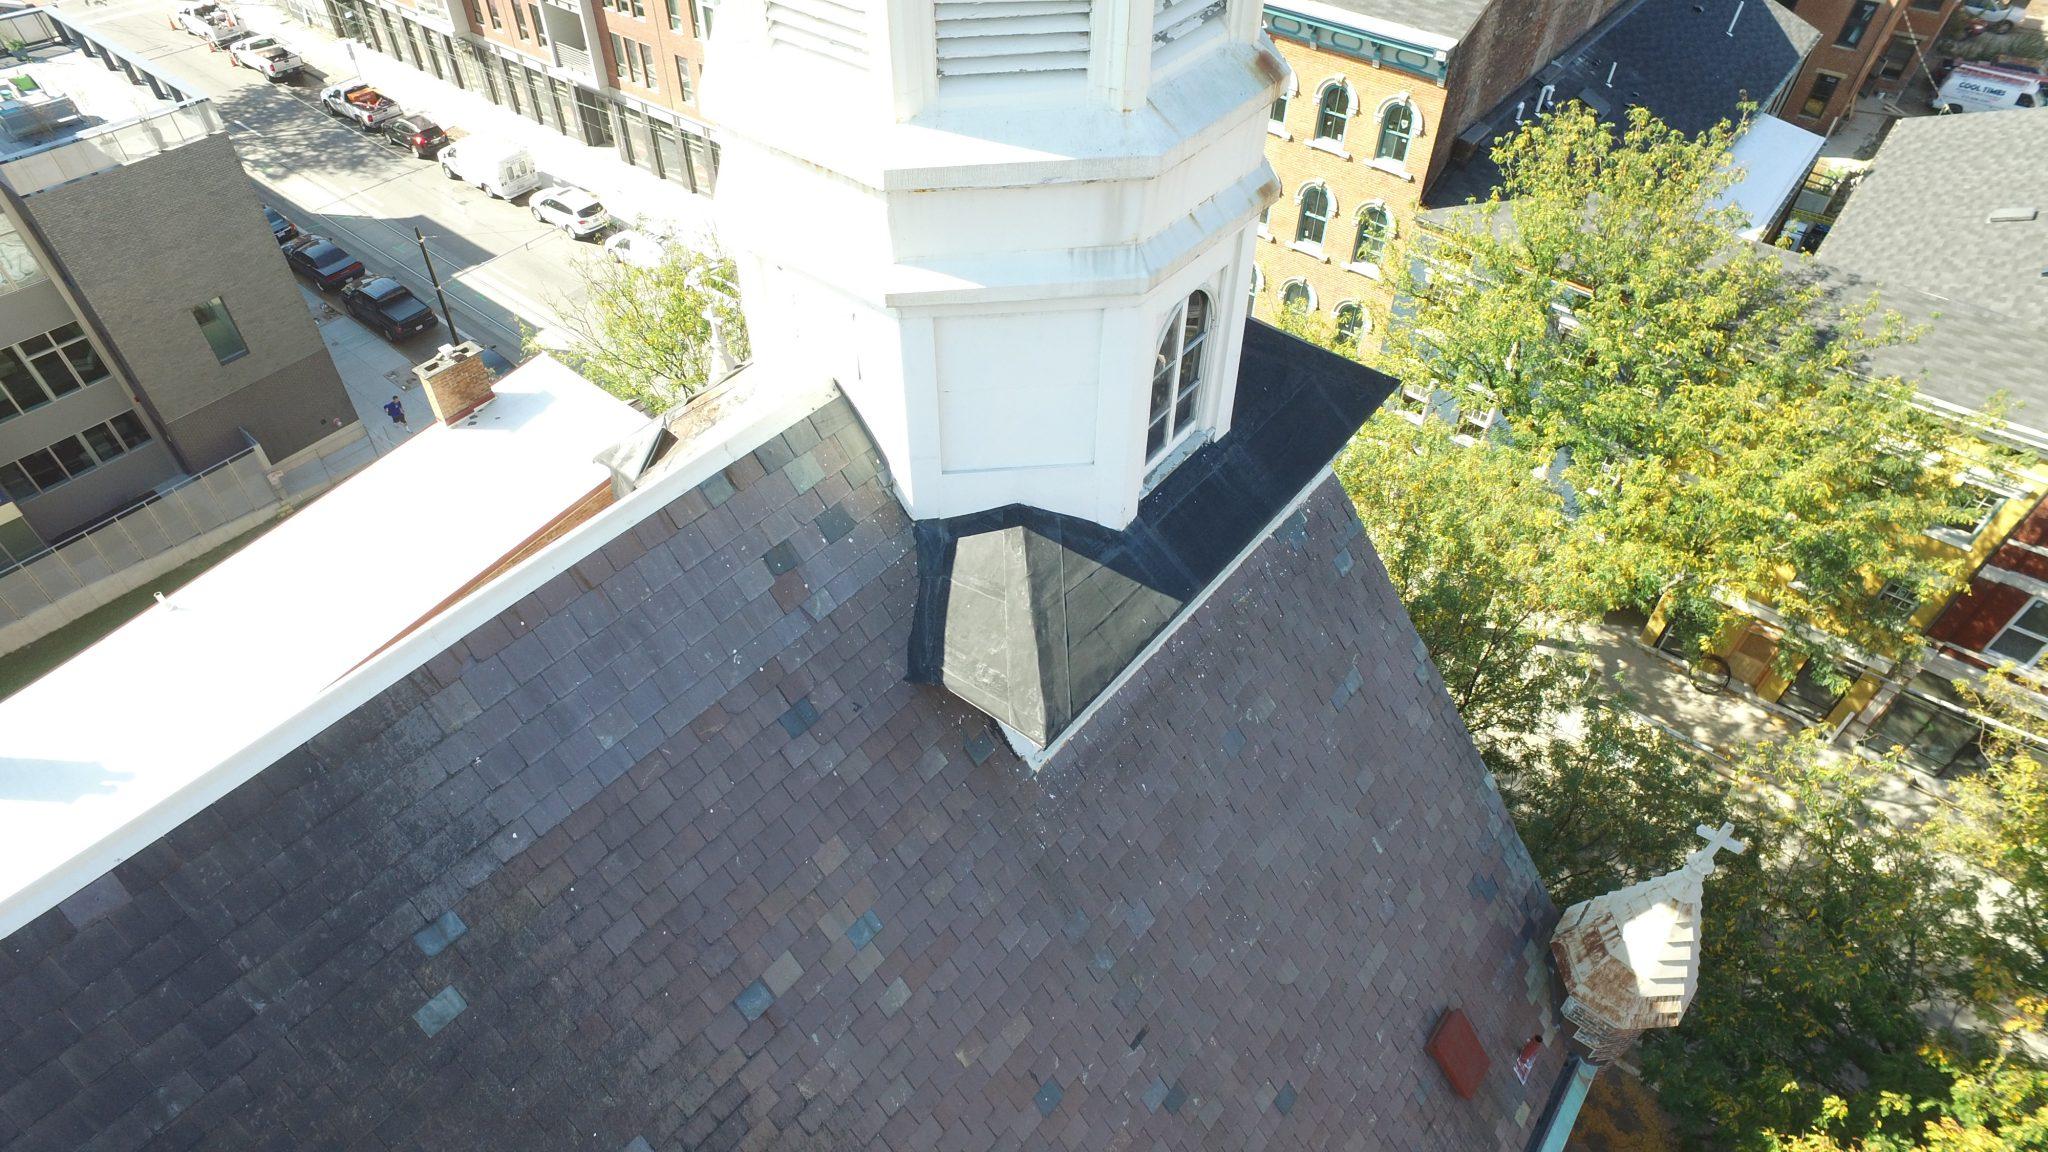 Church Steeple Restoration Hkc